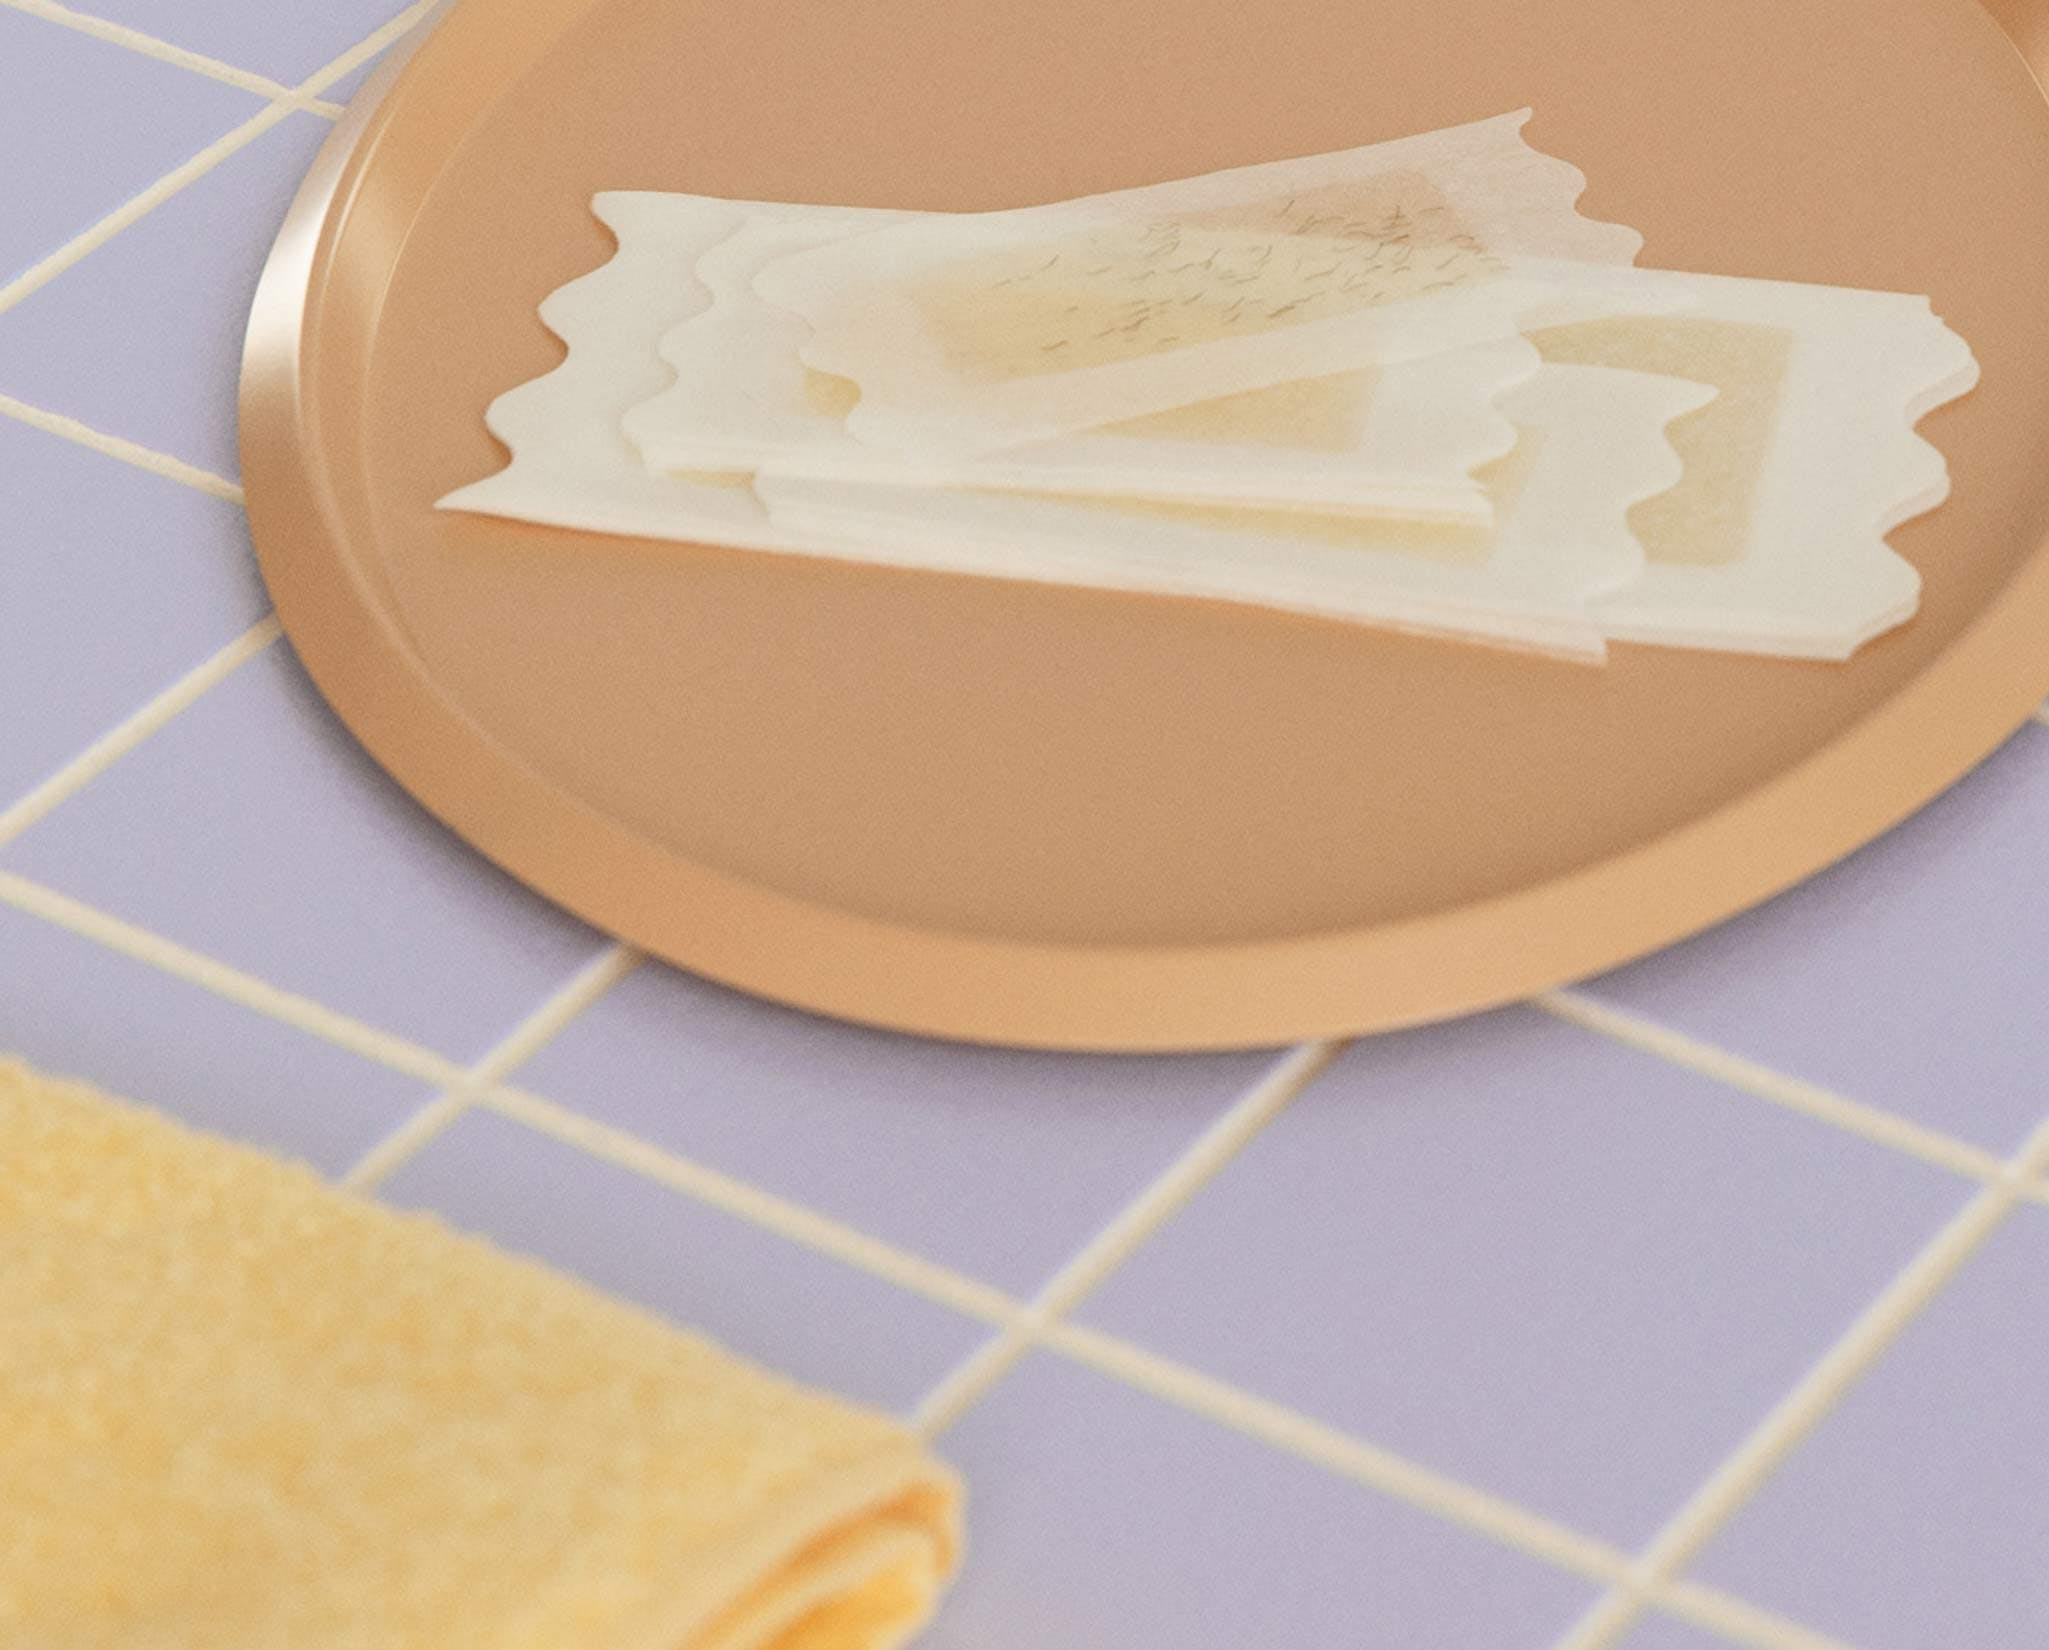 Used wax strips in a bathroom